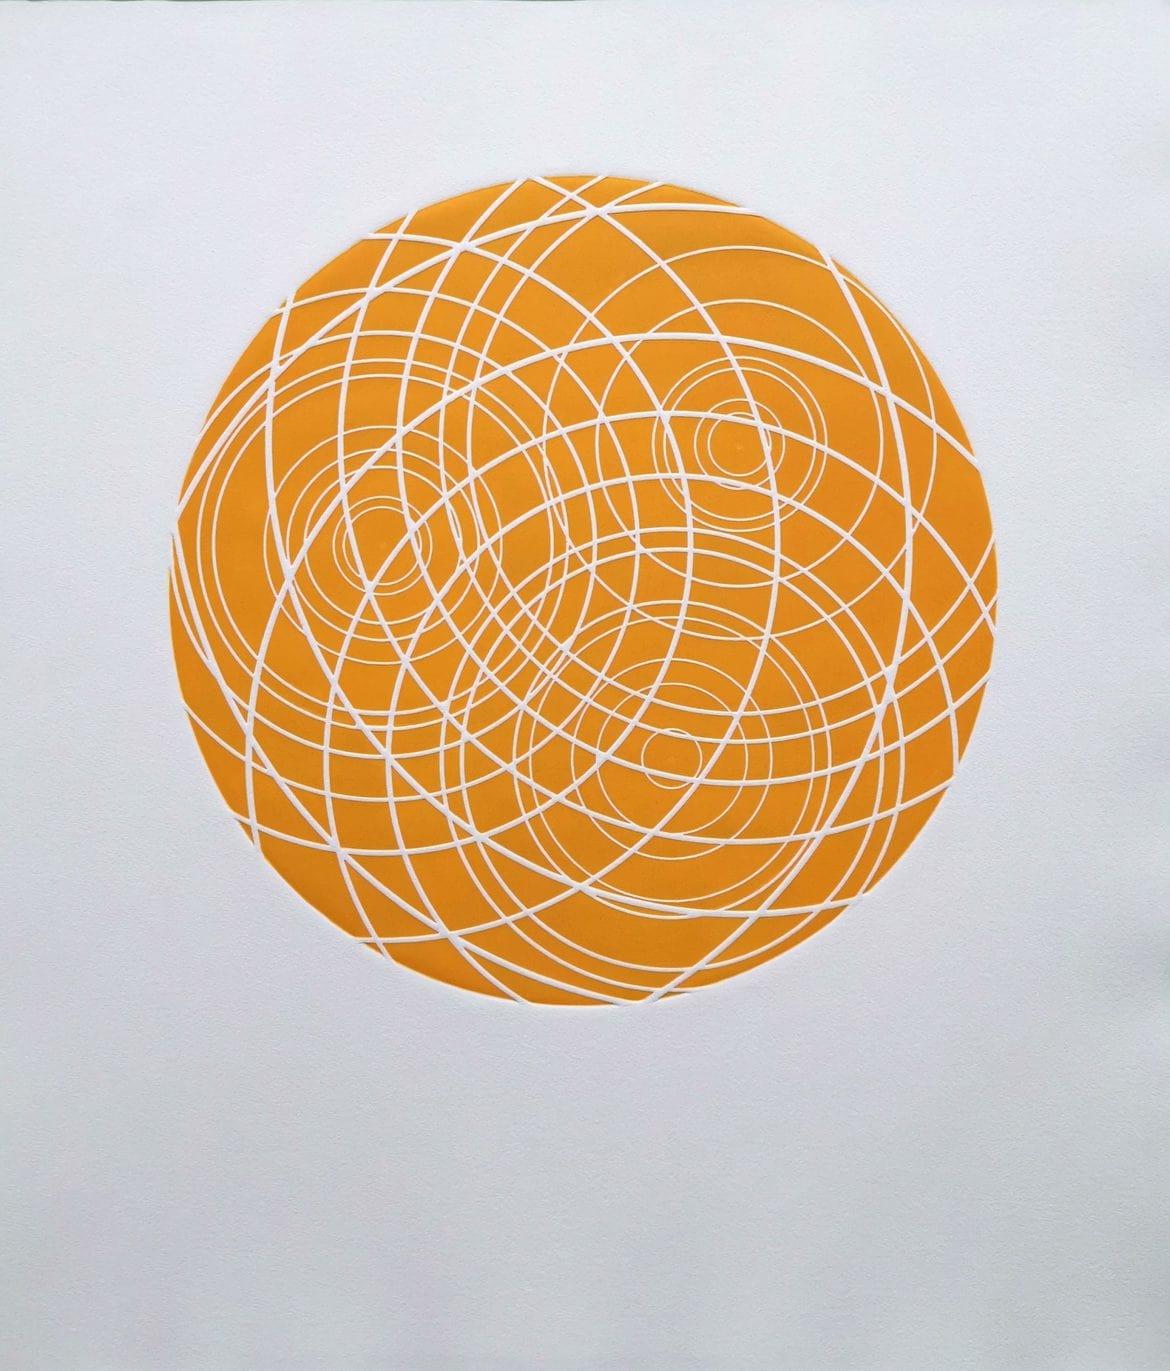 Ripples (Marigold Orange), woodblock print, 300gsm hanhemuhle deckled edge etching paper, edition of 5, 61cm x 52cm